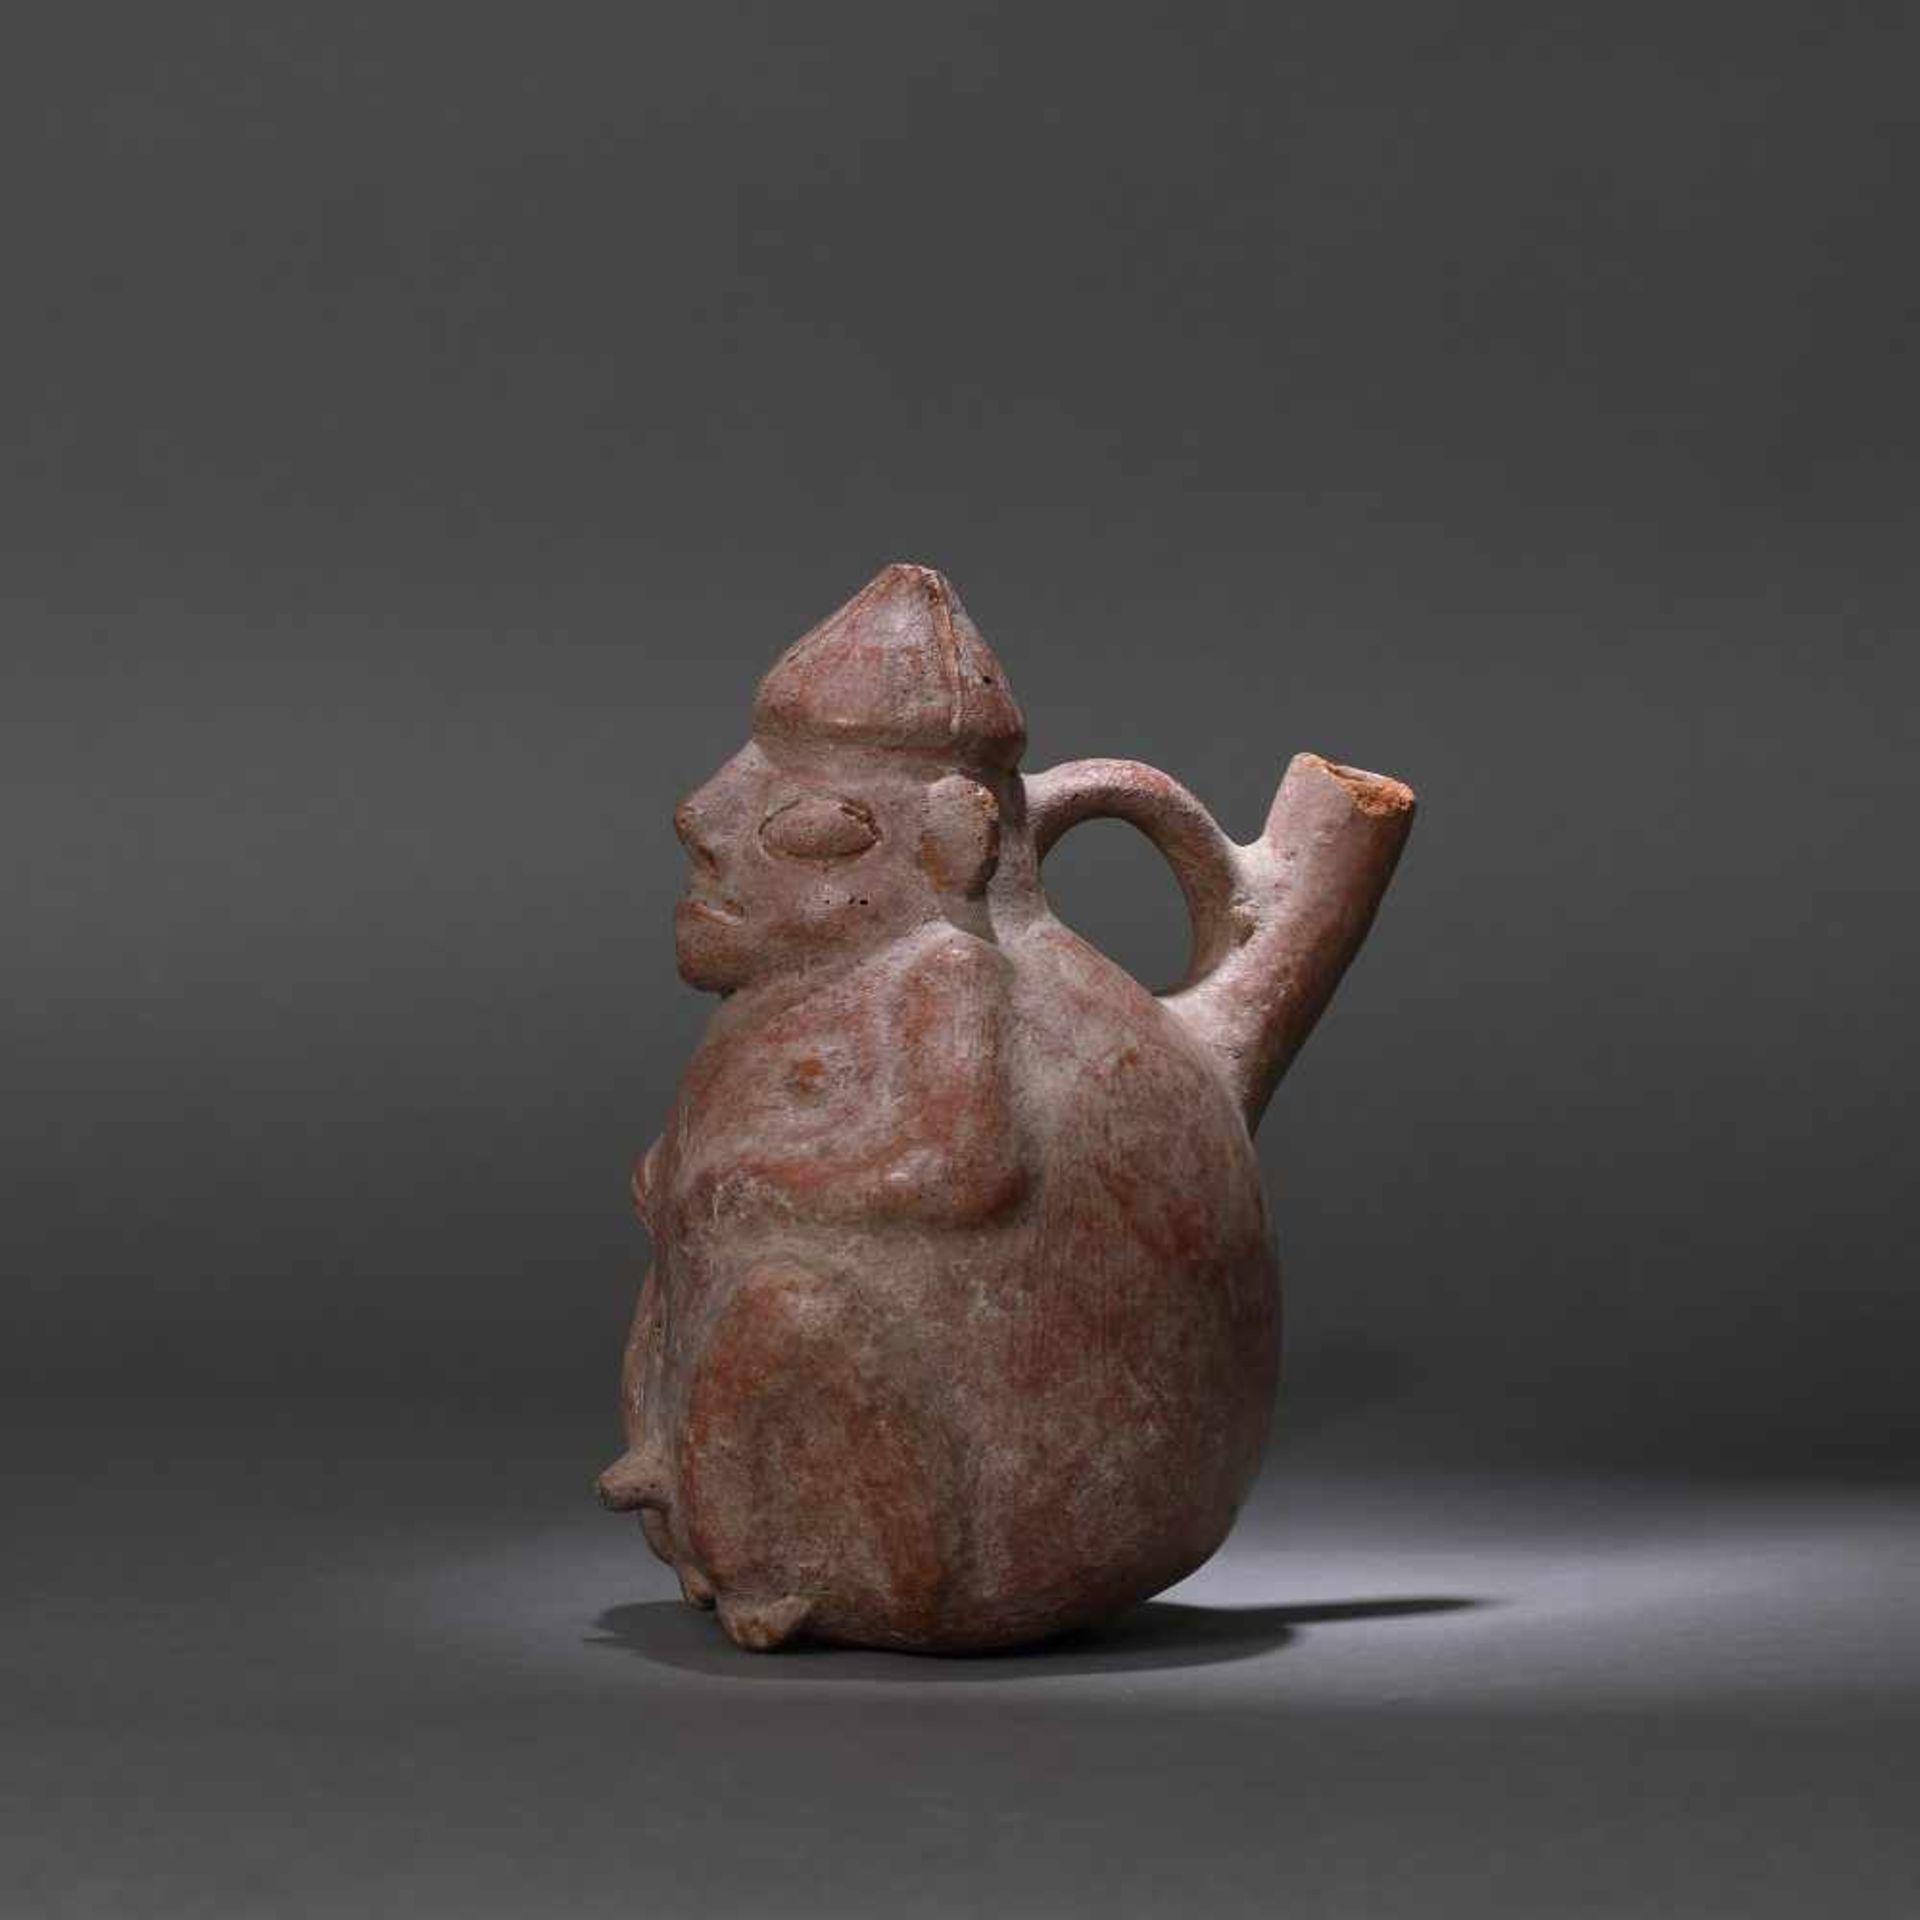 Ceramic vessel, illustrating a man, Vicus culture, Peru, approx. 1,550 years old, 5th century (accom - Bild 4 aus 6